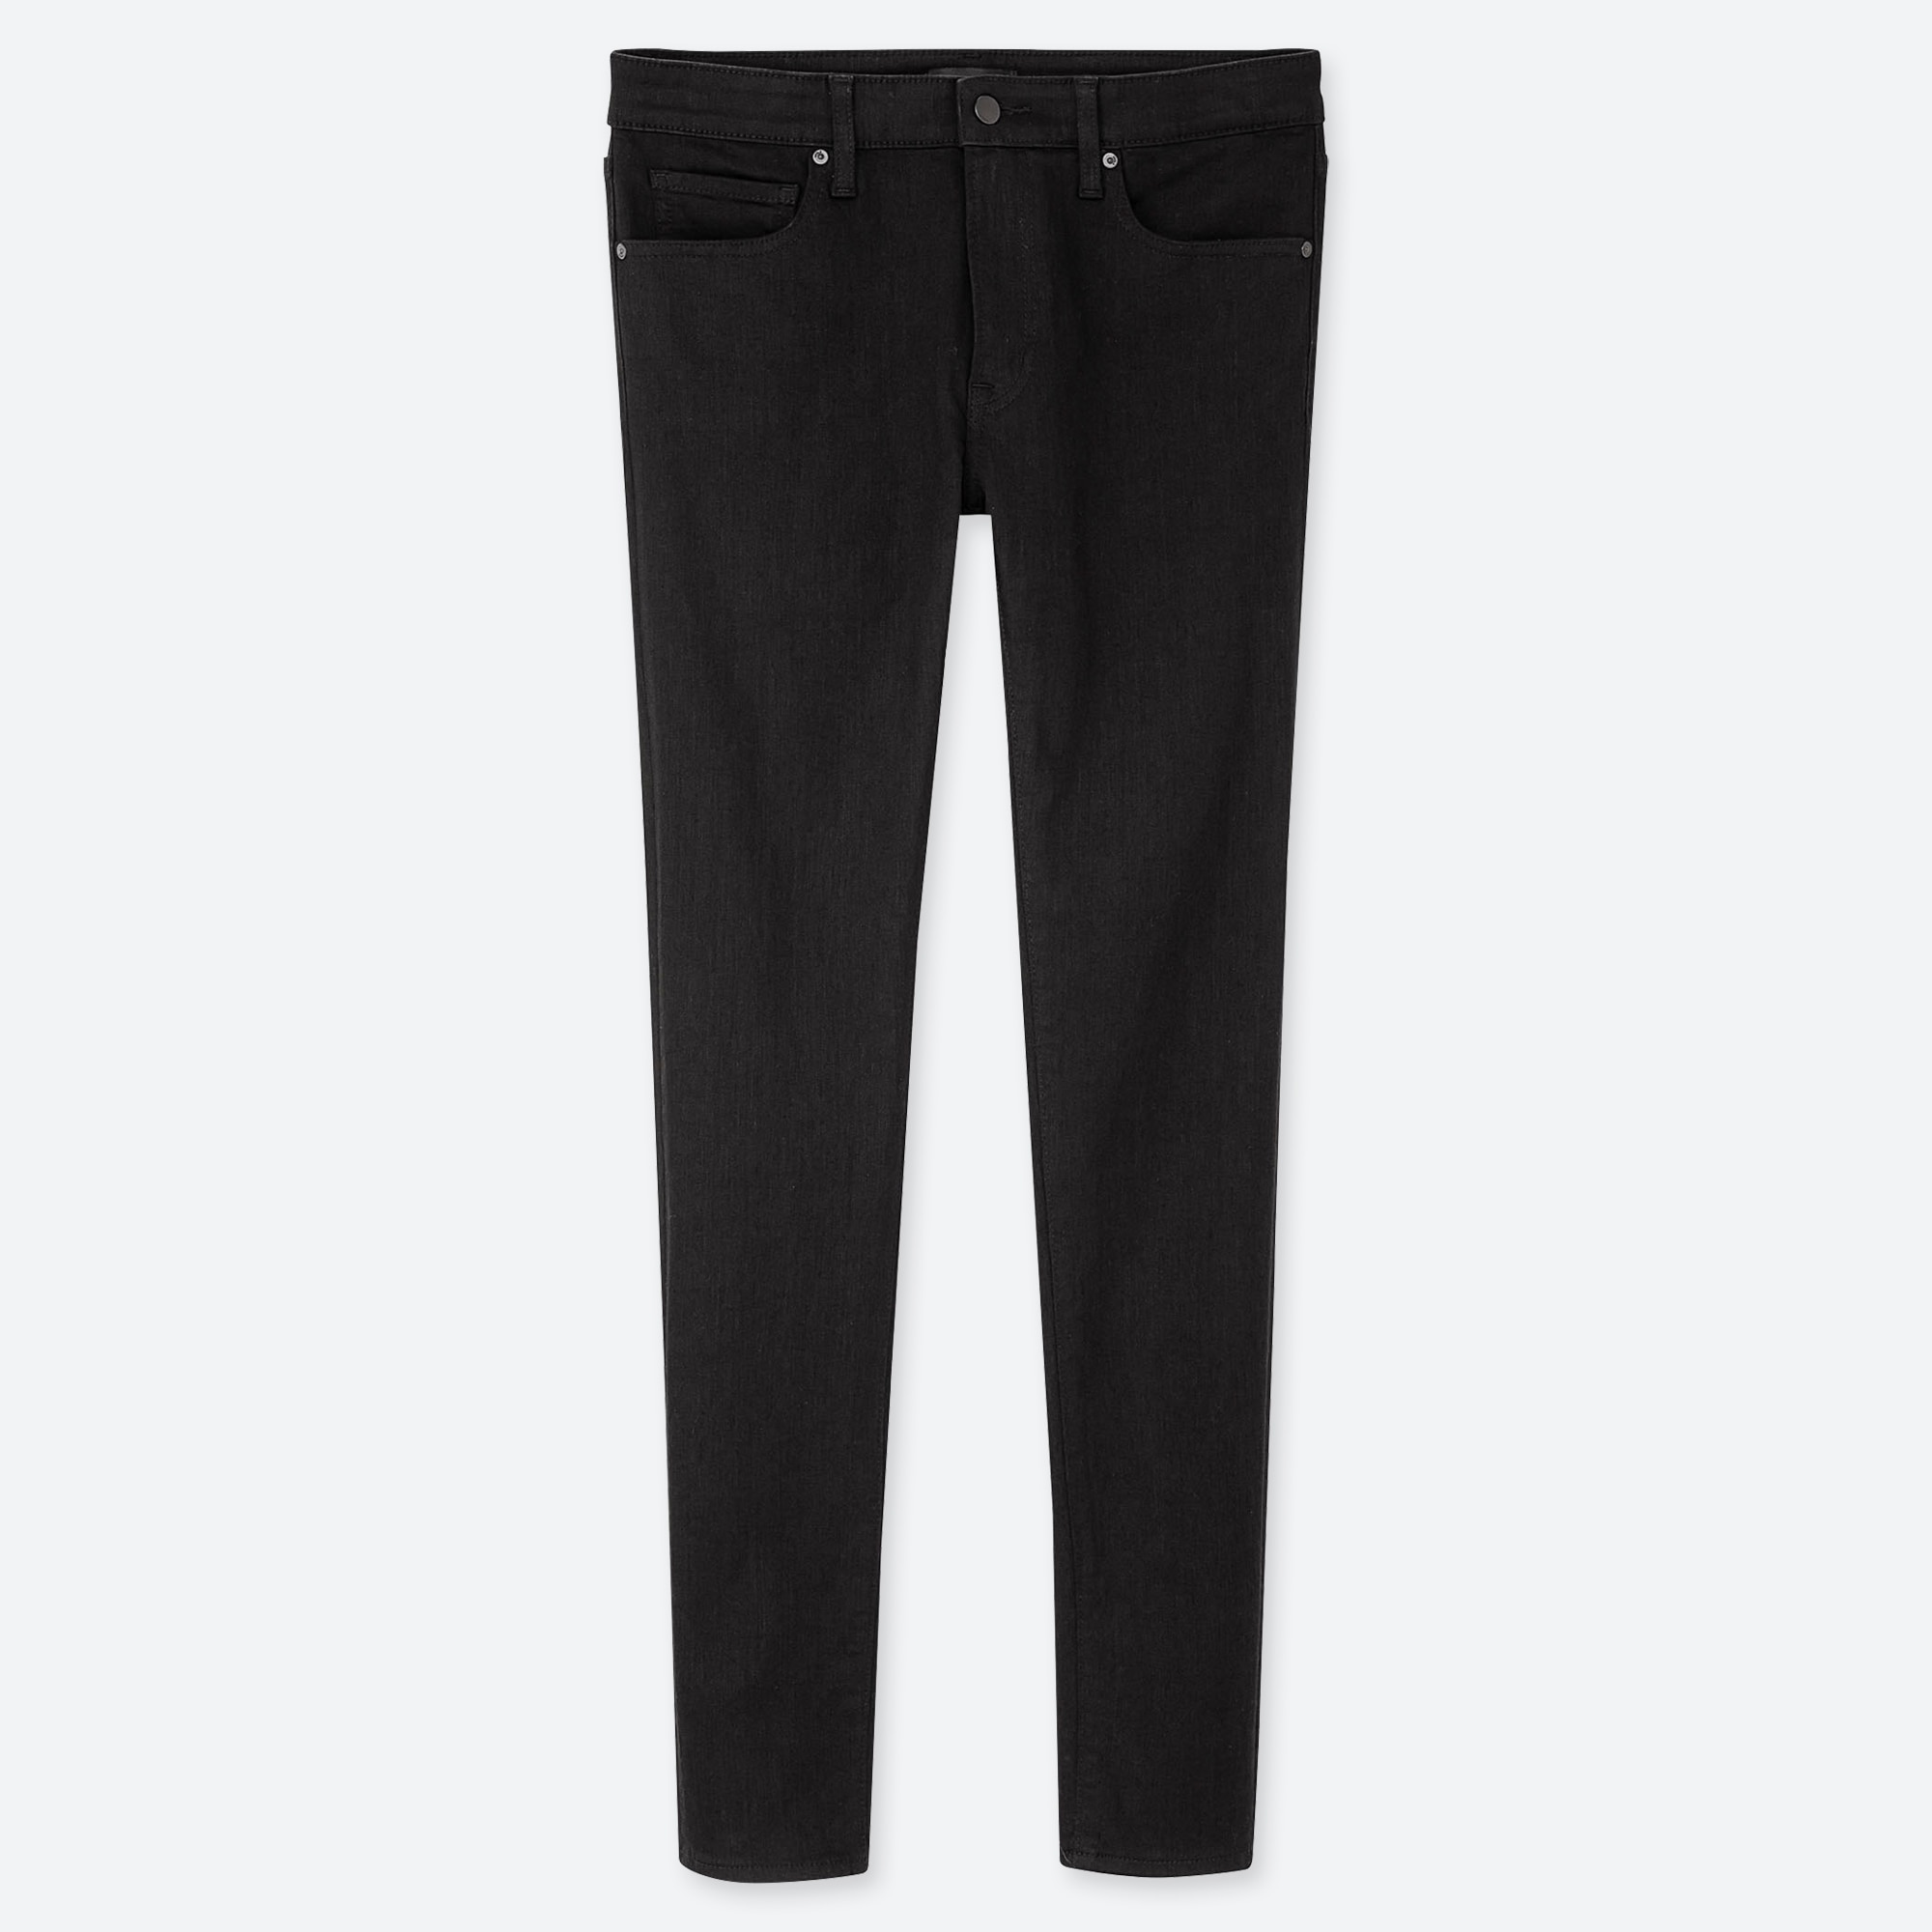 mens black stretch skinny jeans uk